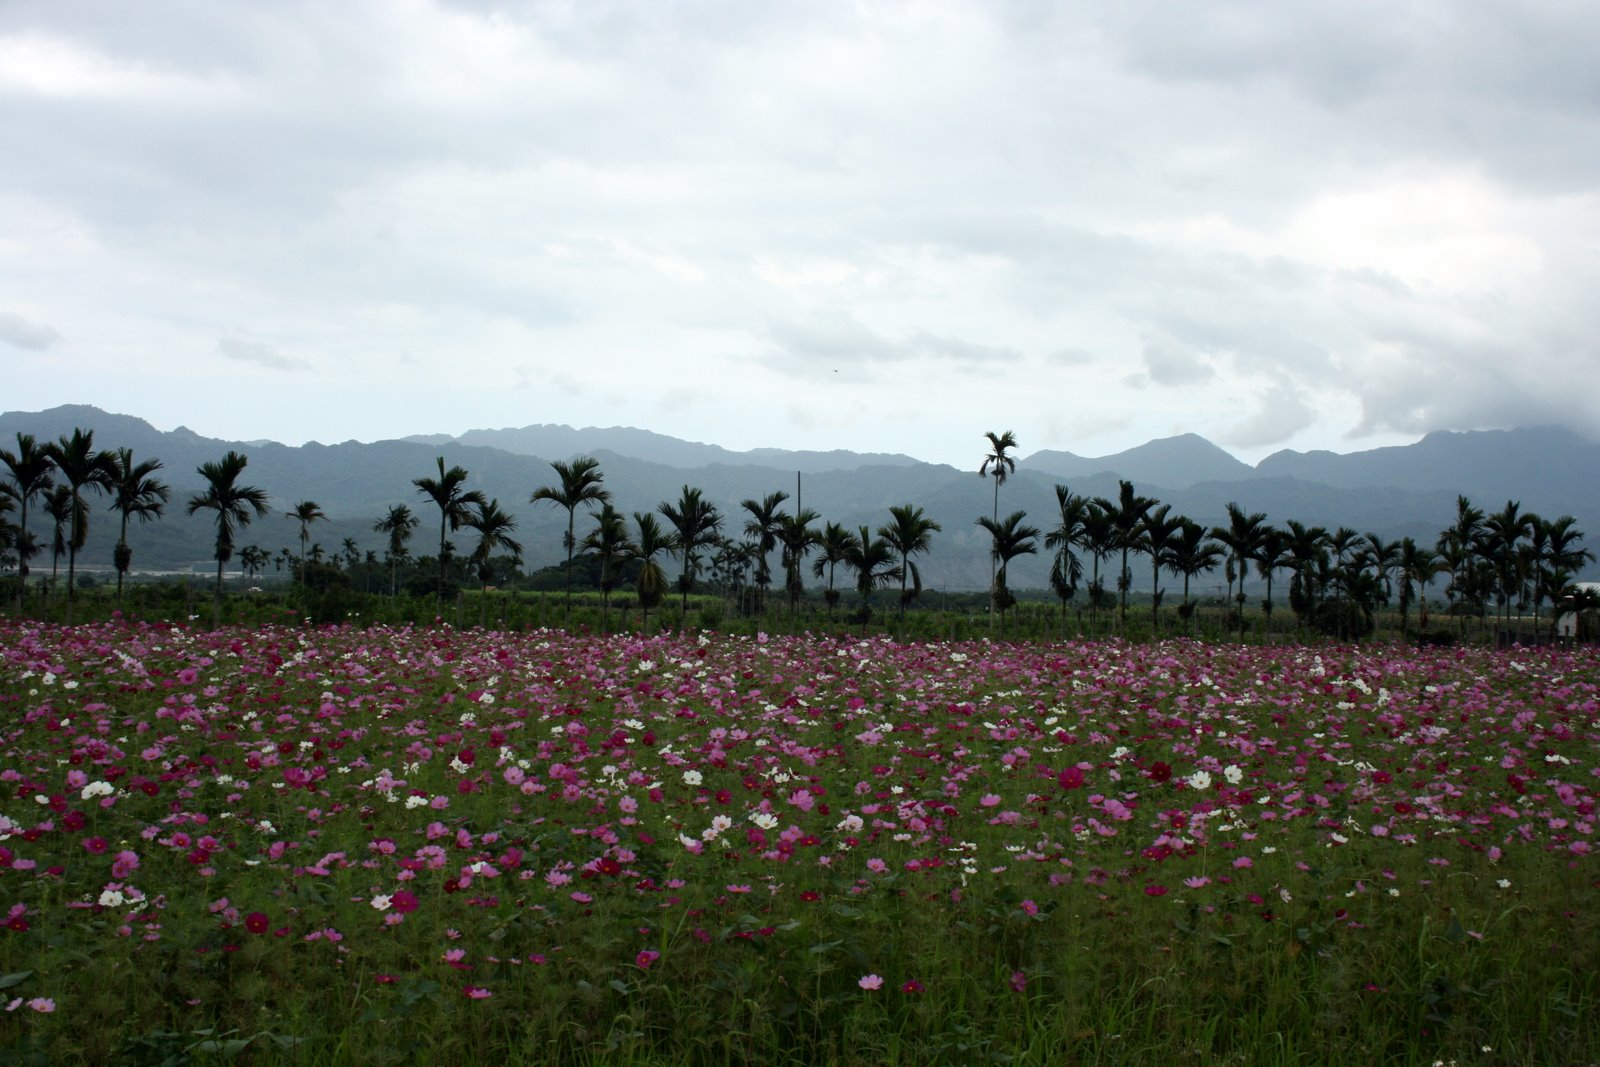 A Tanka About Formosa (Beautiful Island) - Poem by Chenou Liu